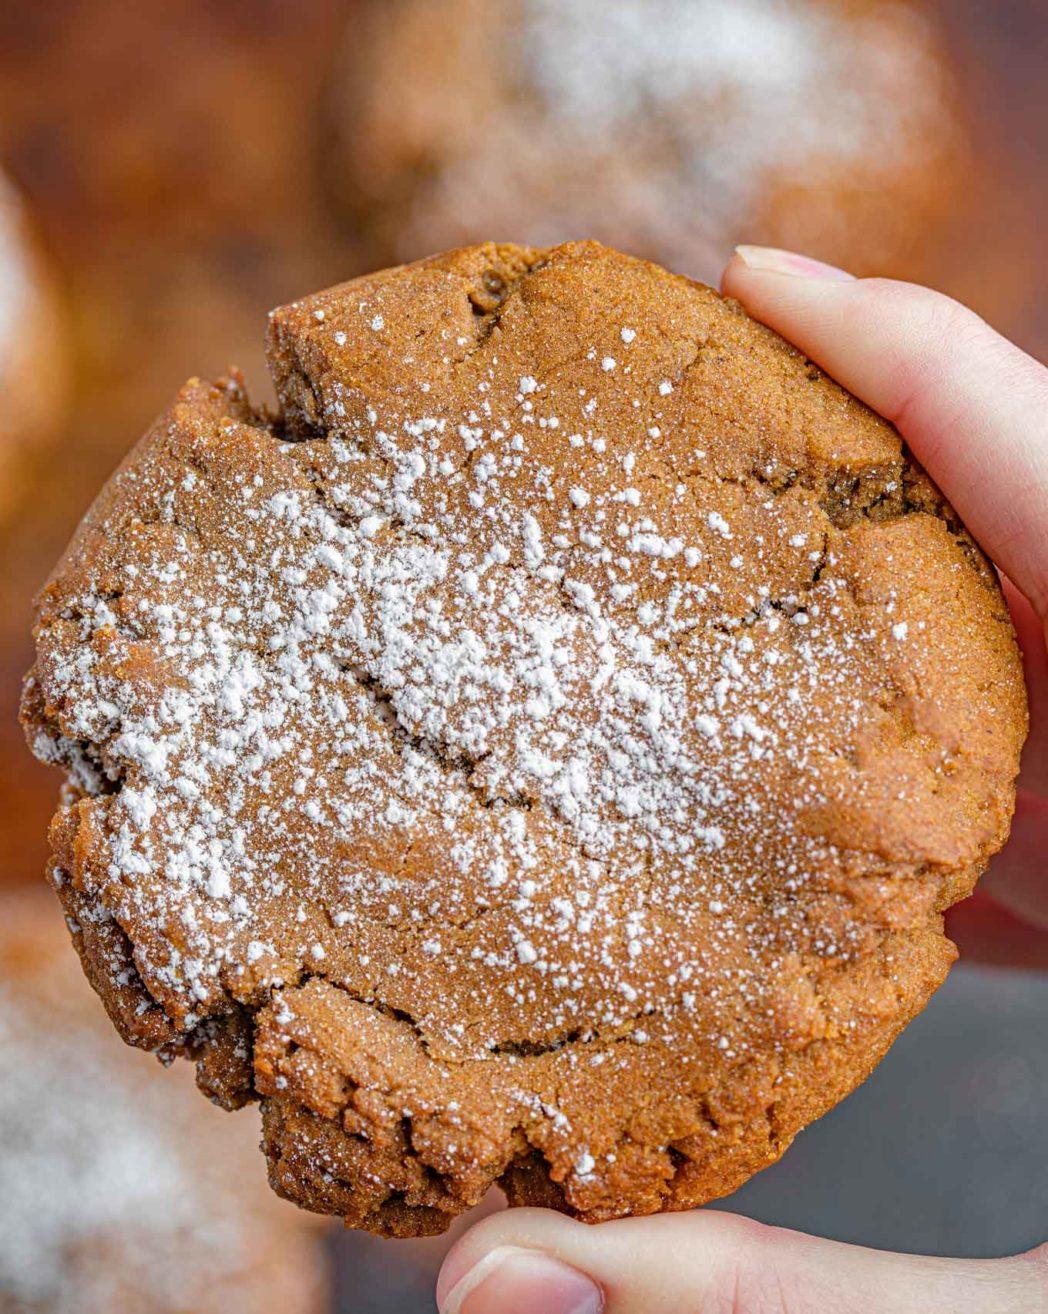 Ginger Cookie being held